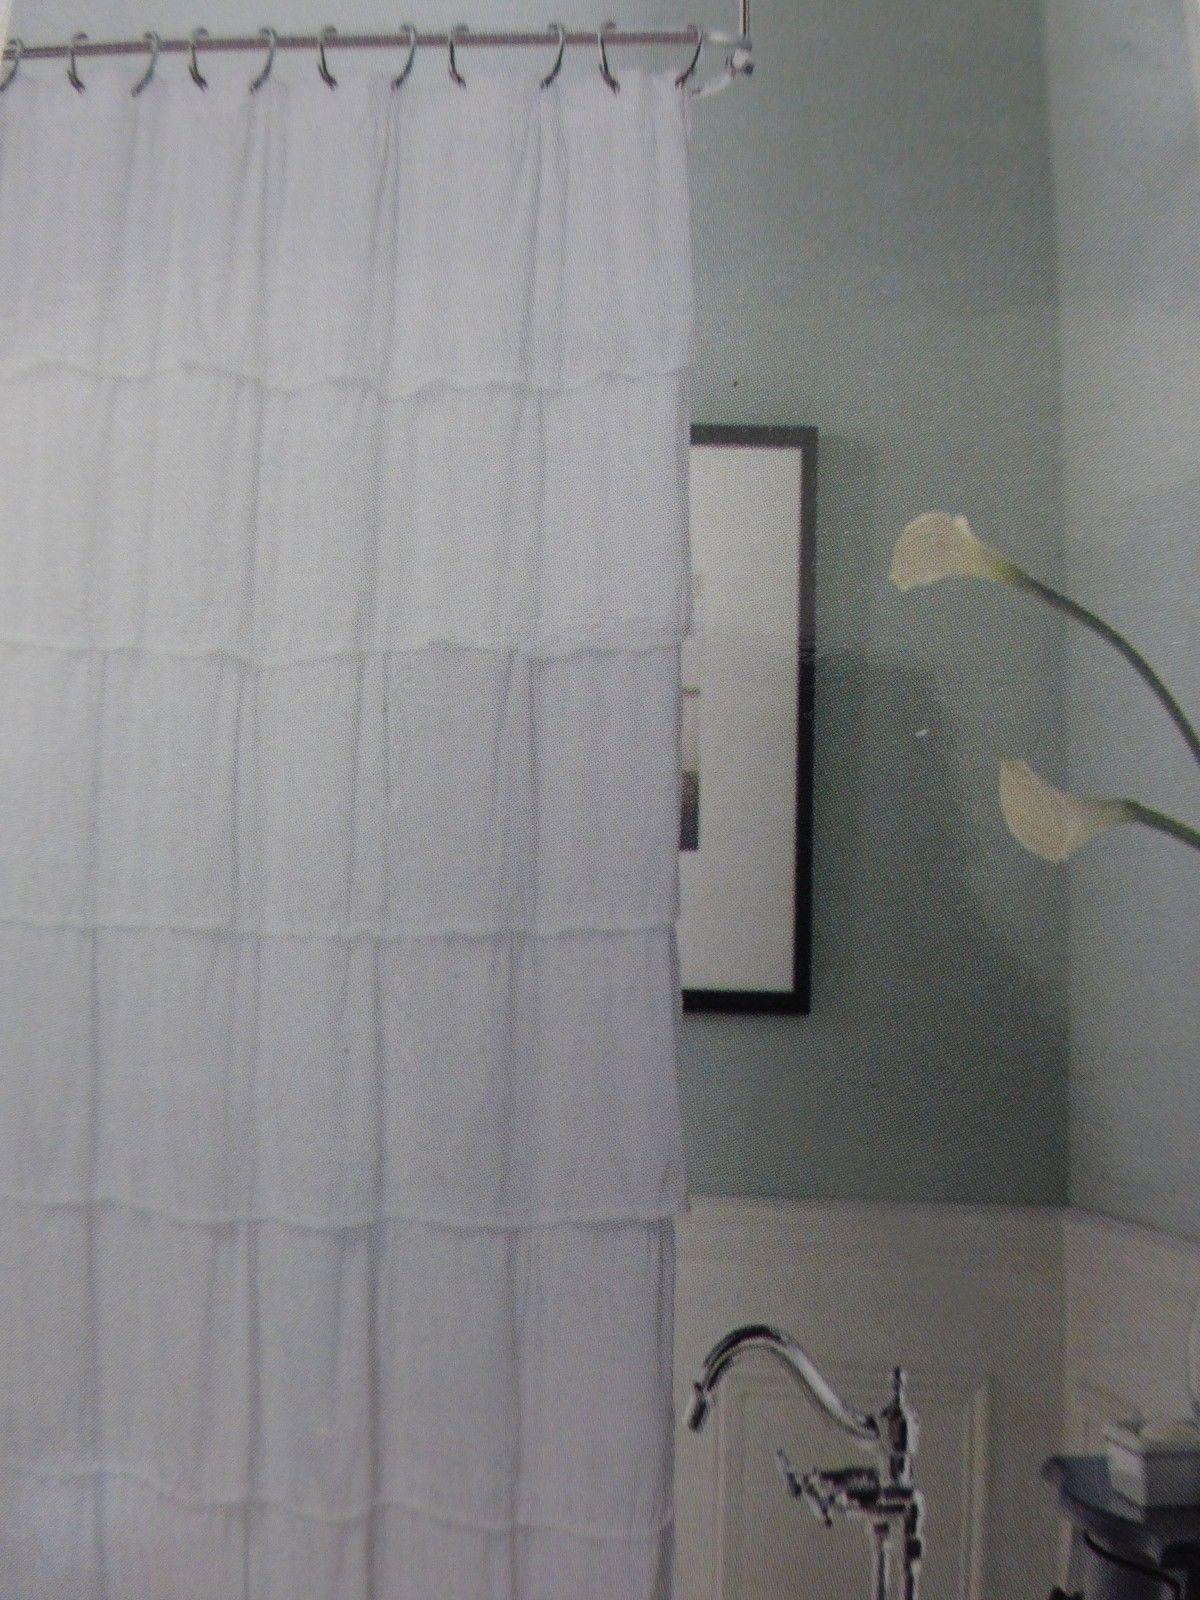 Dainty Home Luxury Collection White Malaga Fabric Shower Curtain 72 X 72 Nip